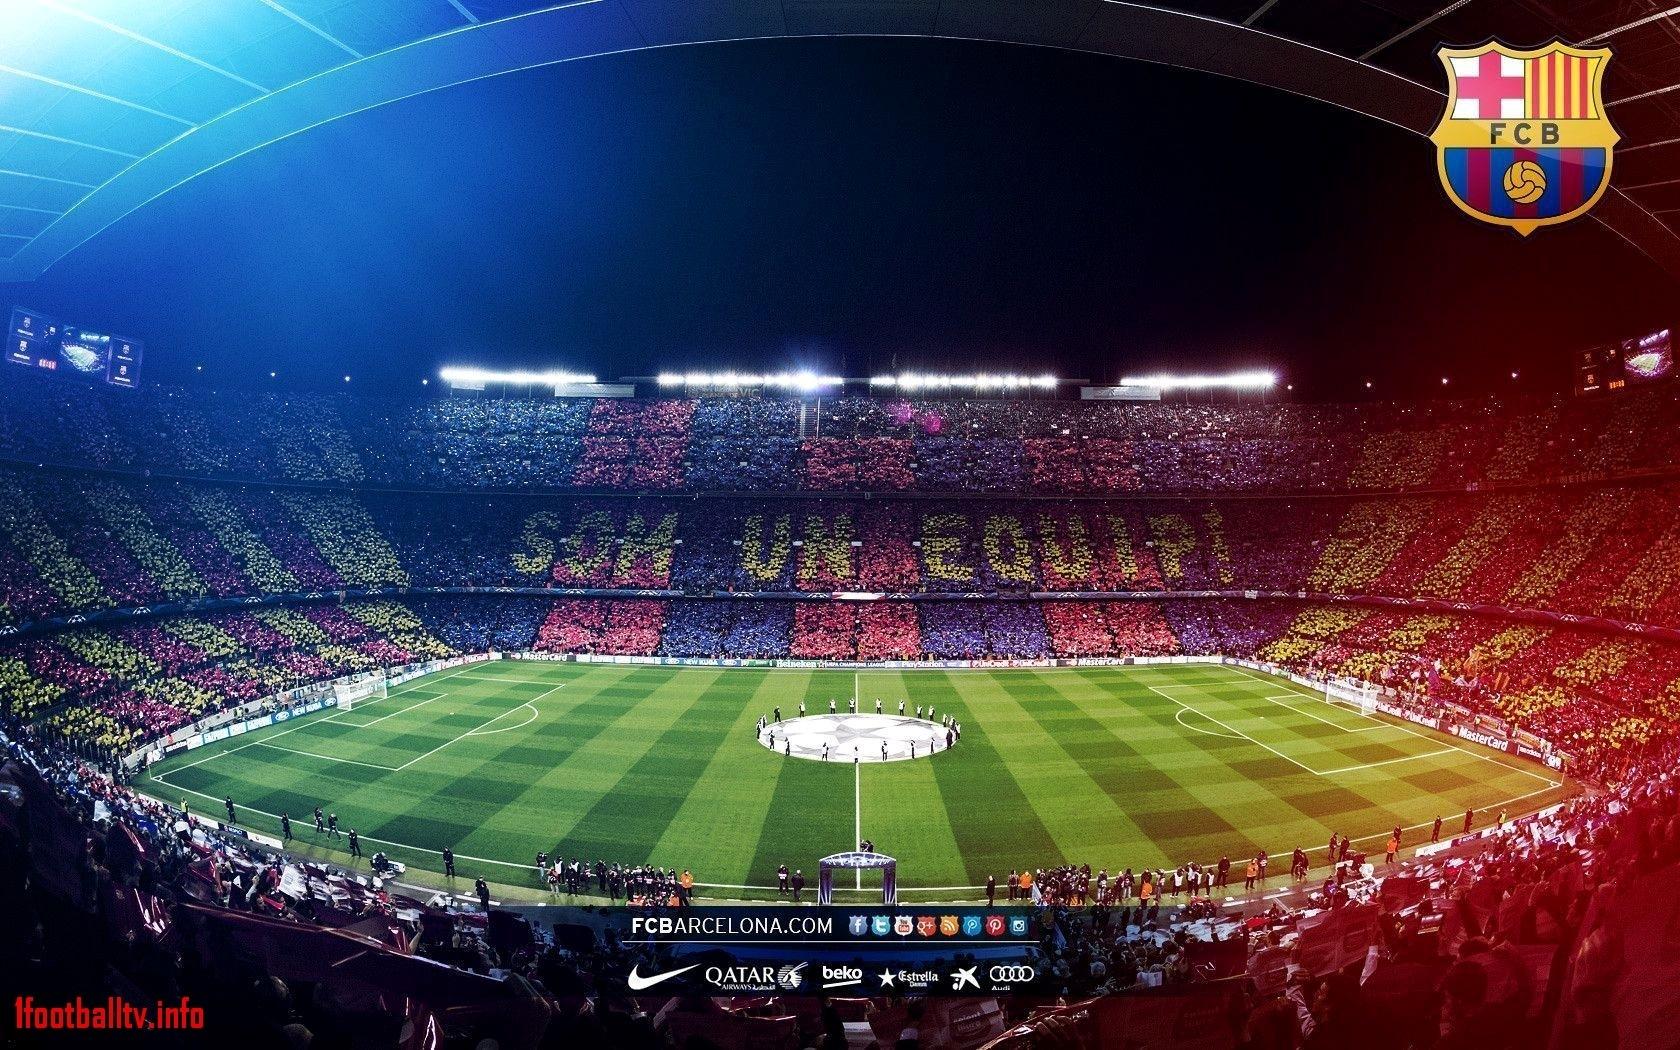 Title : inspirational fc barcelona wallpapers tumblr - best football hd. Dimension : 1680 x 1050. File Type : JPG/JPEG